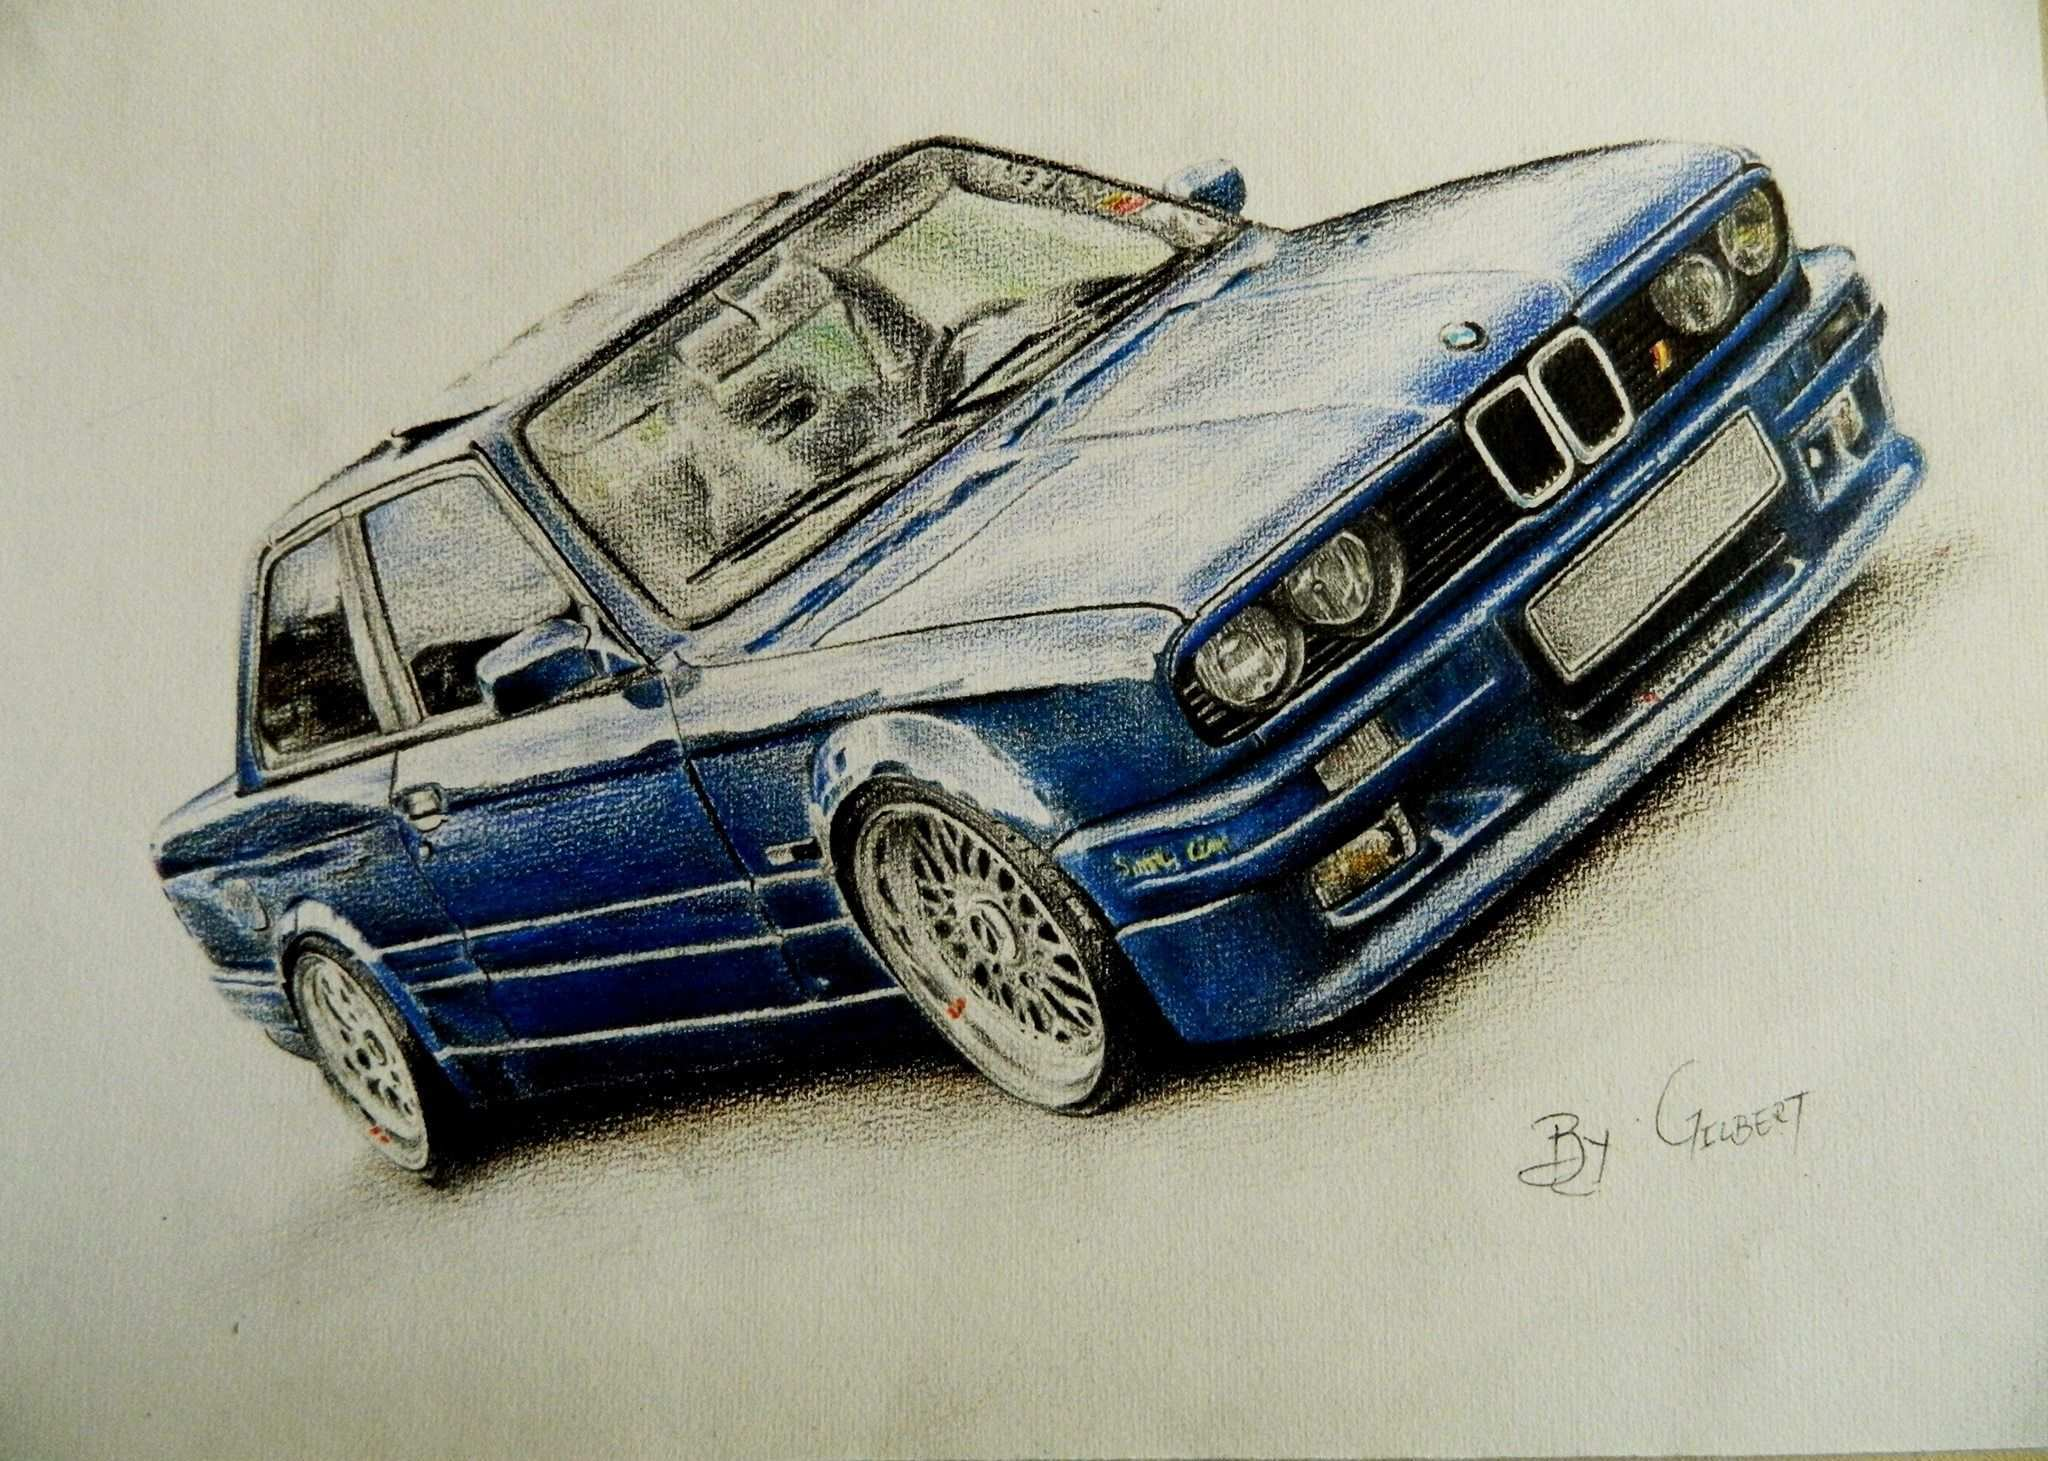 Bmw E30 Colored Pencils Drawing Art By Gilbert Maepa Bmw E 30 Zeichnungen Malen Und Bleistift